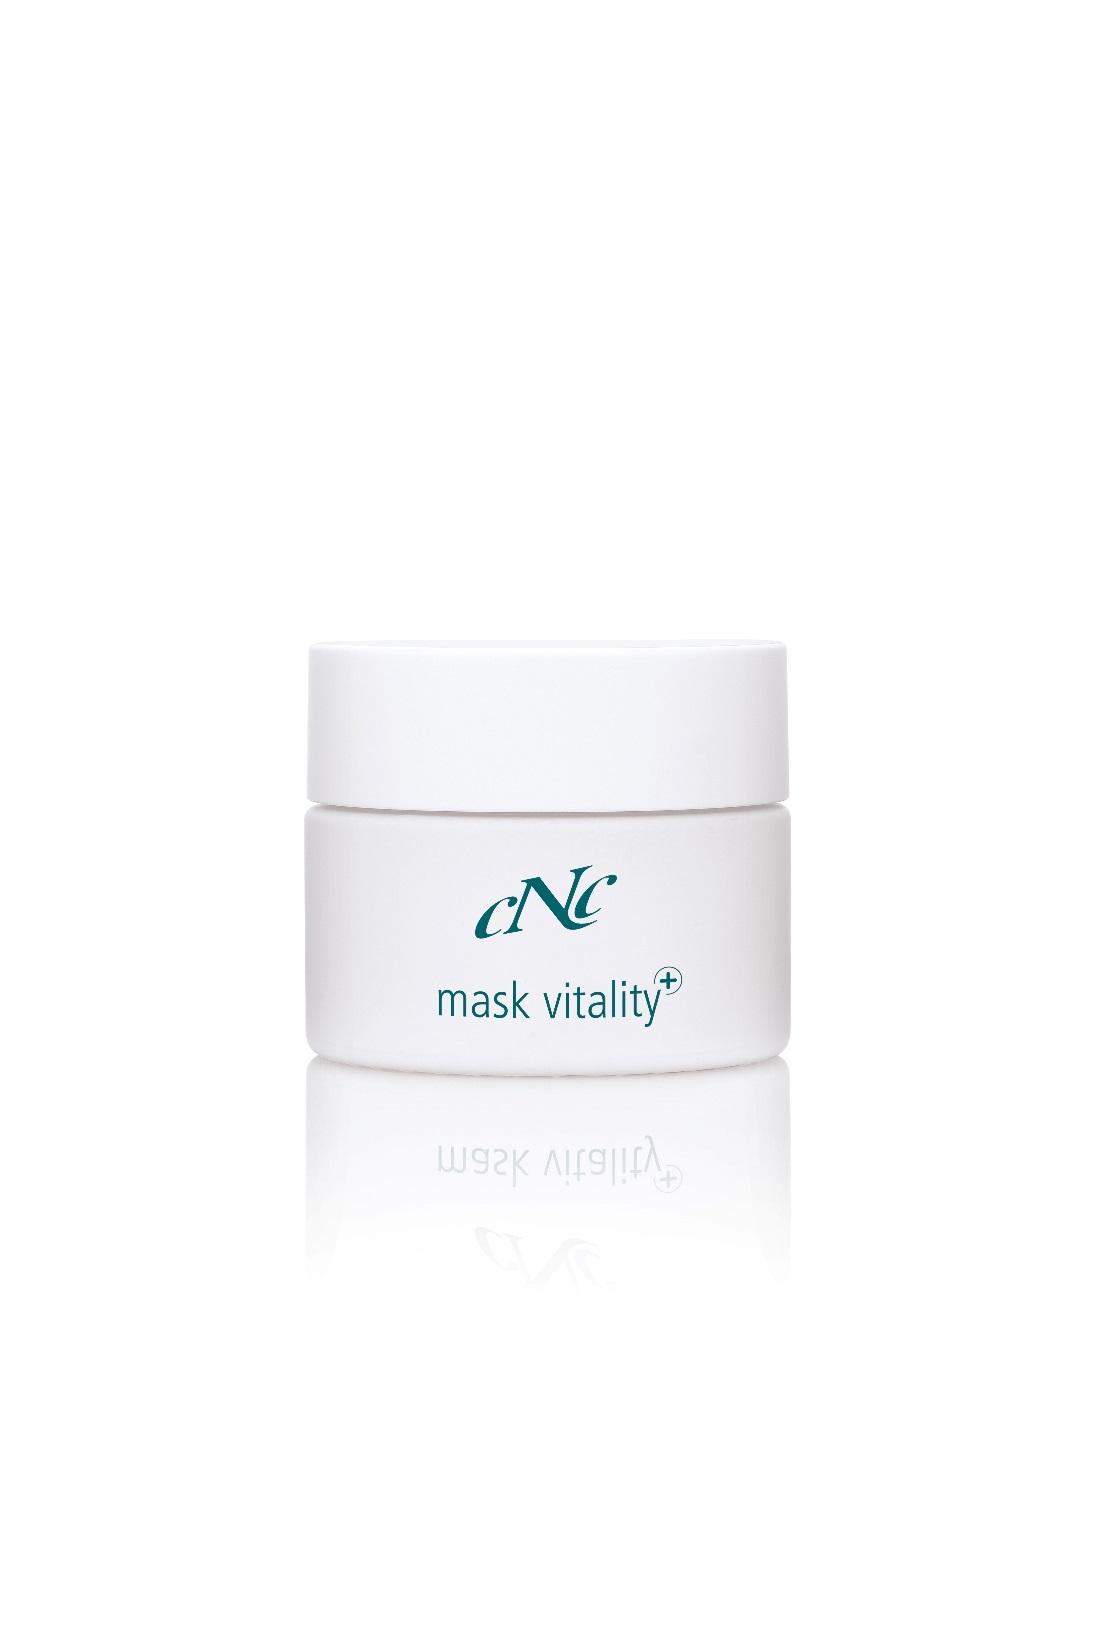 mask vitality